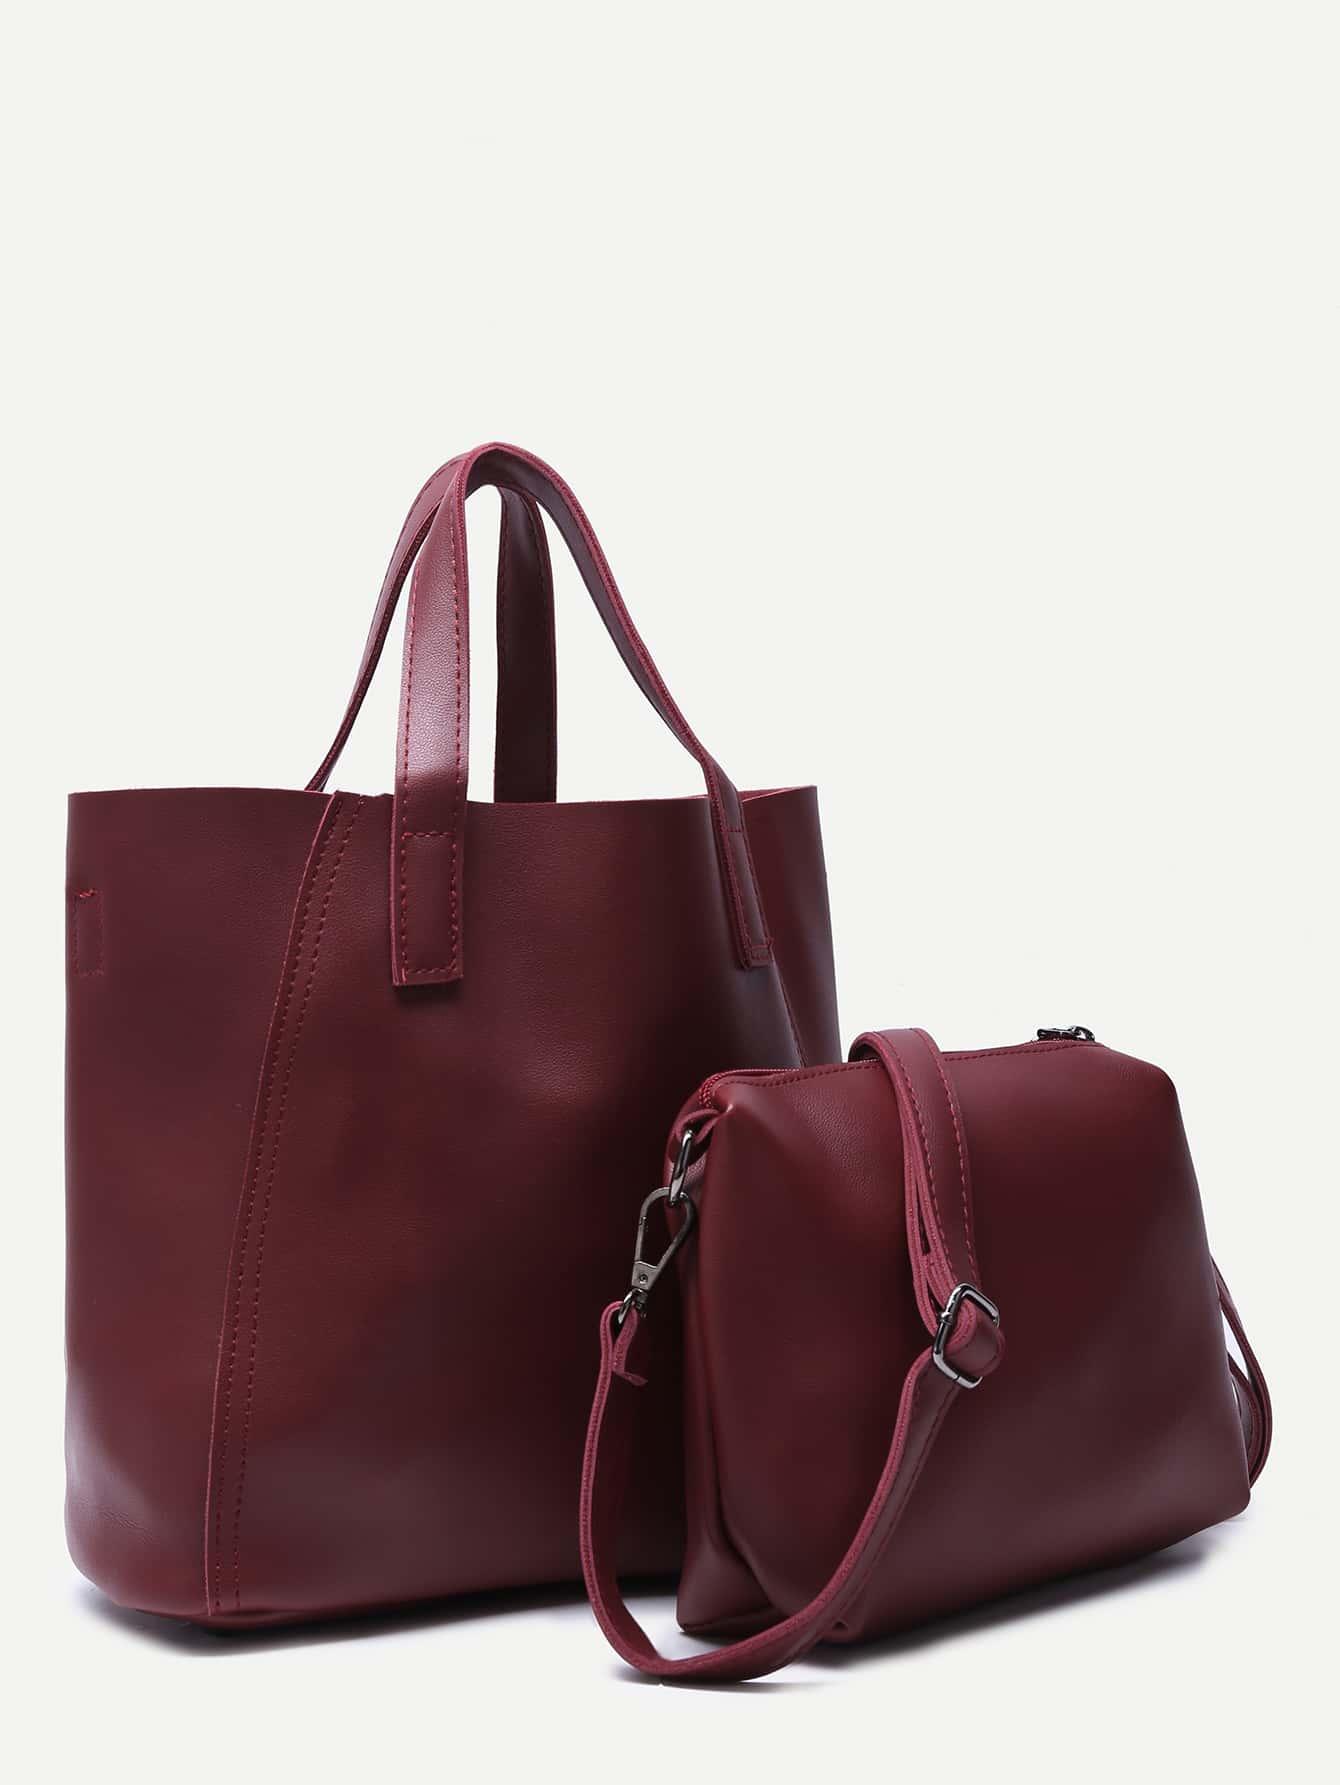 bag161123904_2